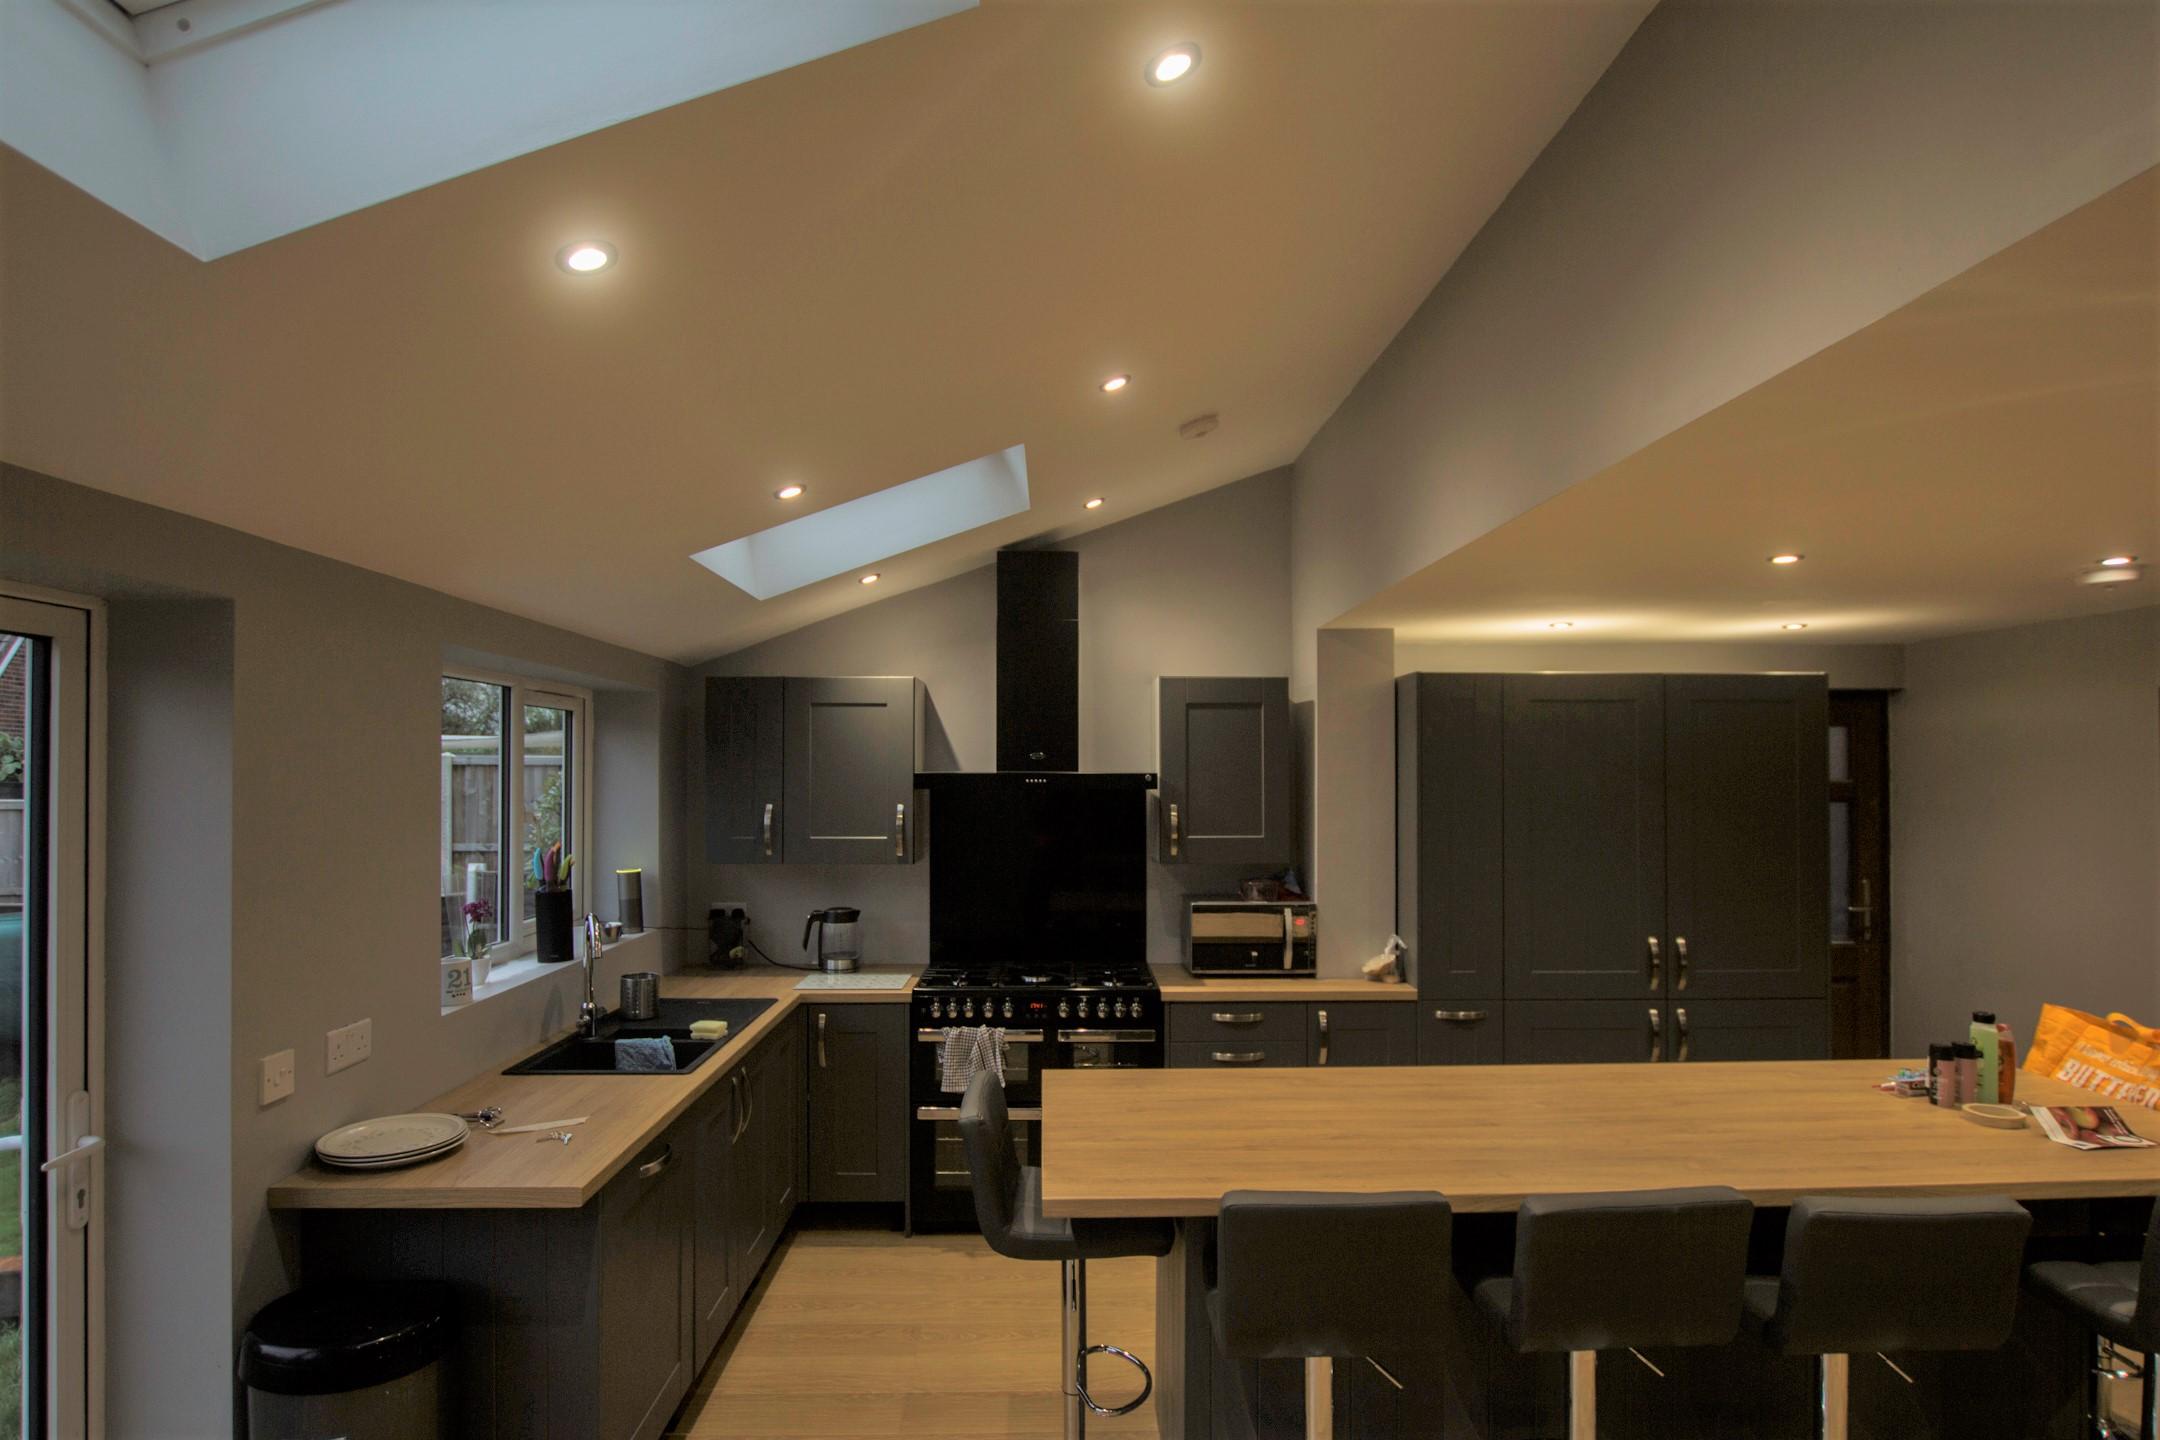 Single storey rear kitchen extension